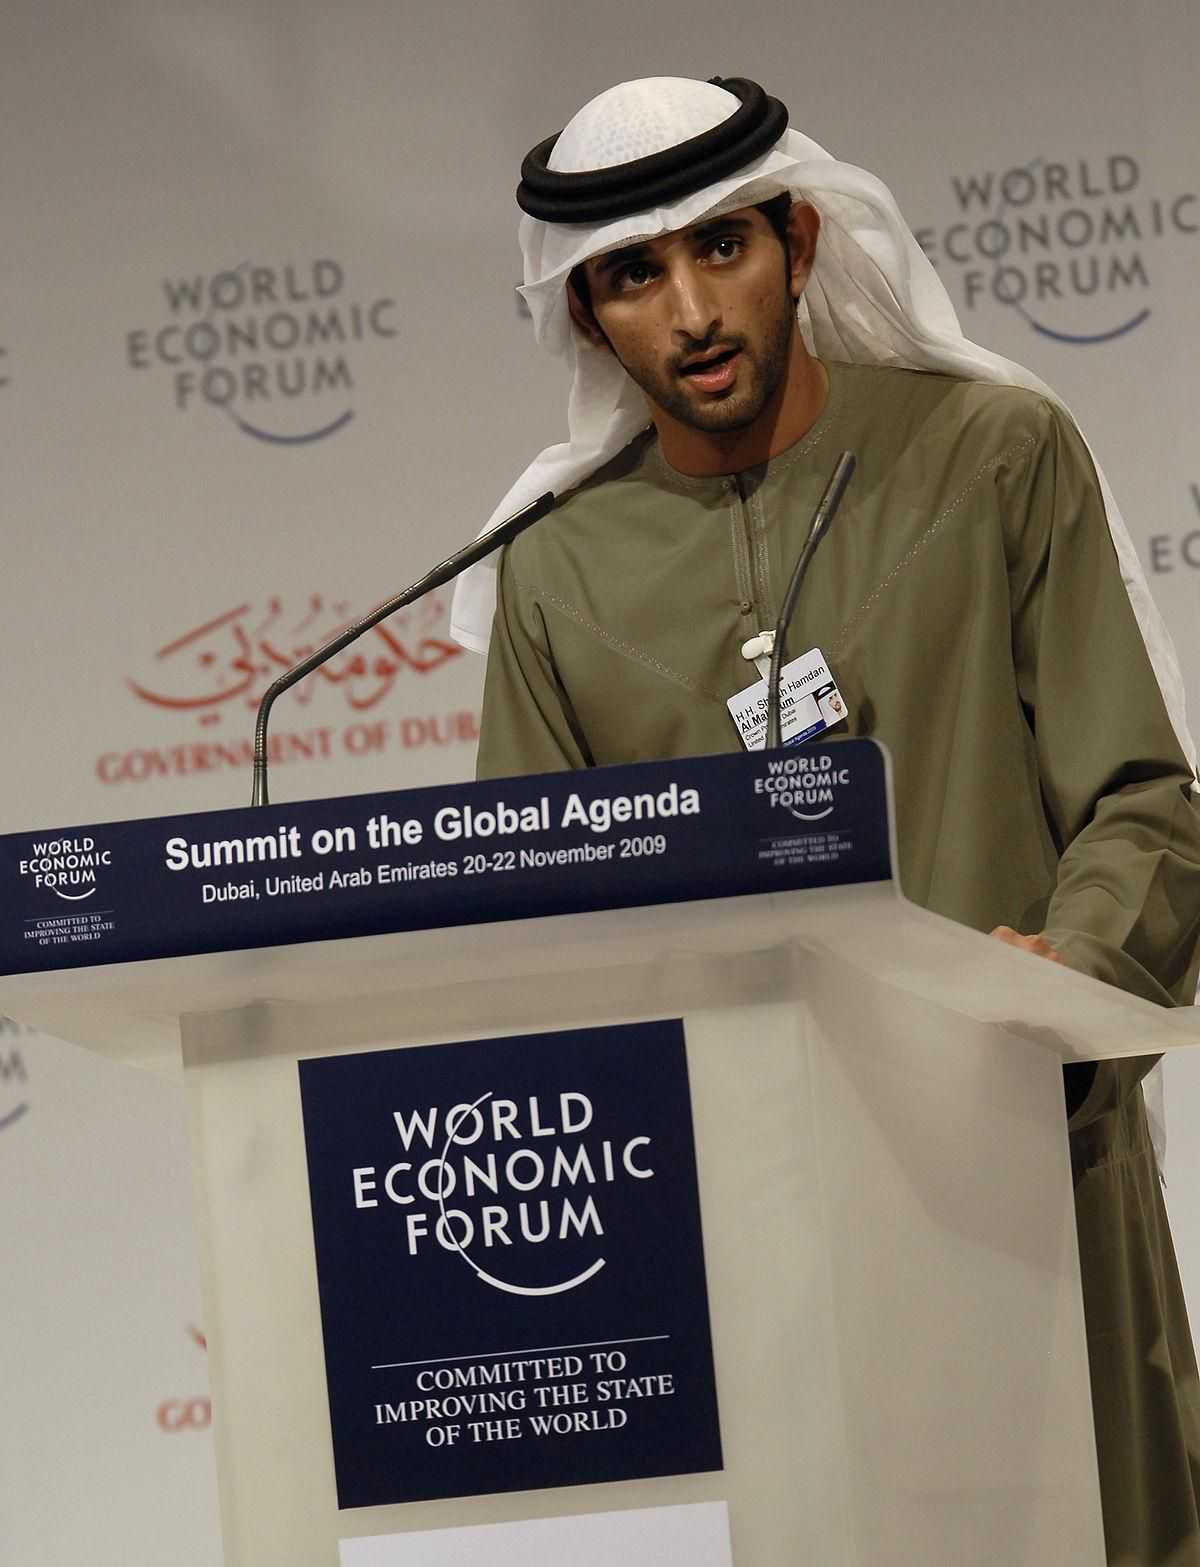 1200px H.H. Sheikh Hamdan Bin Mohammed Bin Rashid Al Maktoum in Summit on the Global Agenda